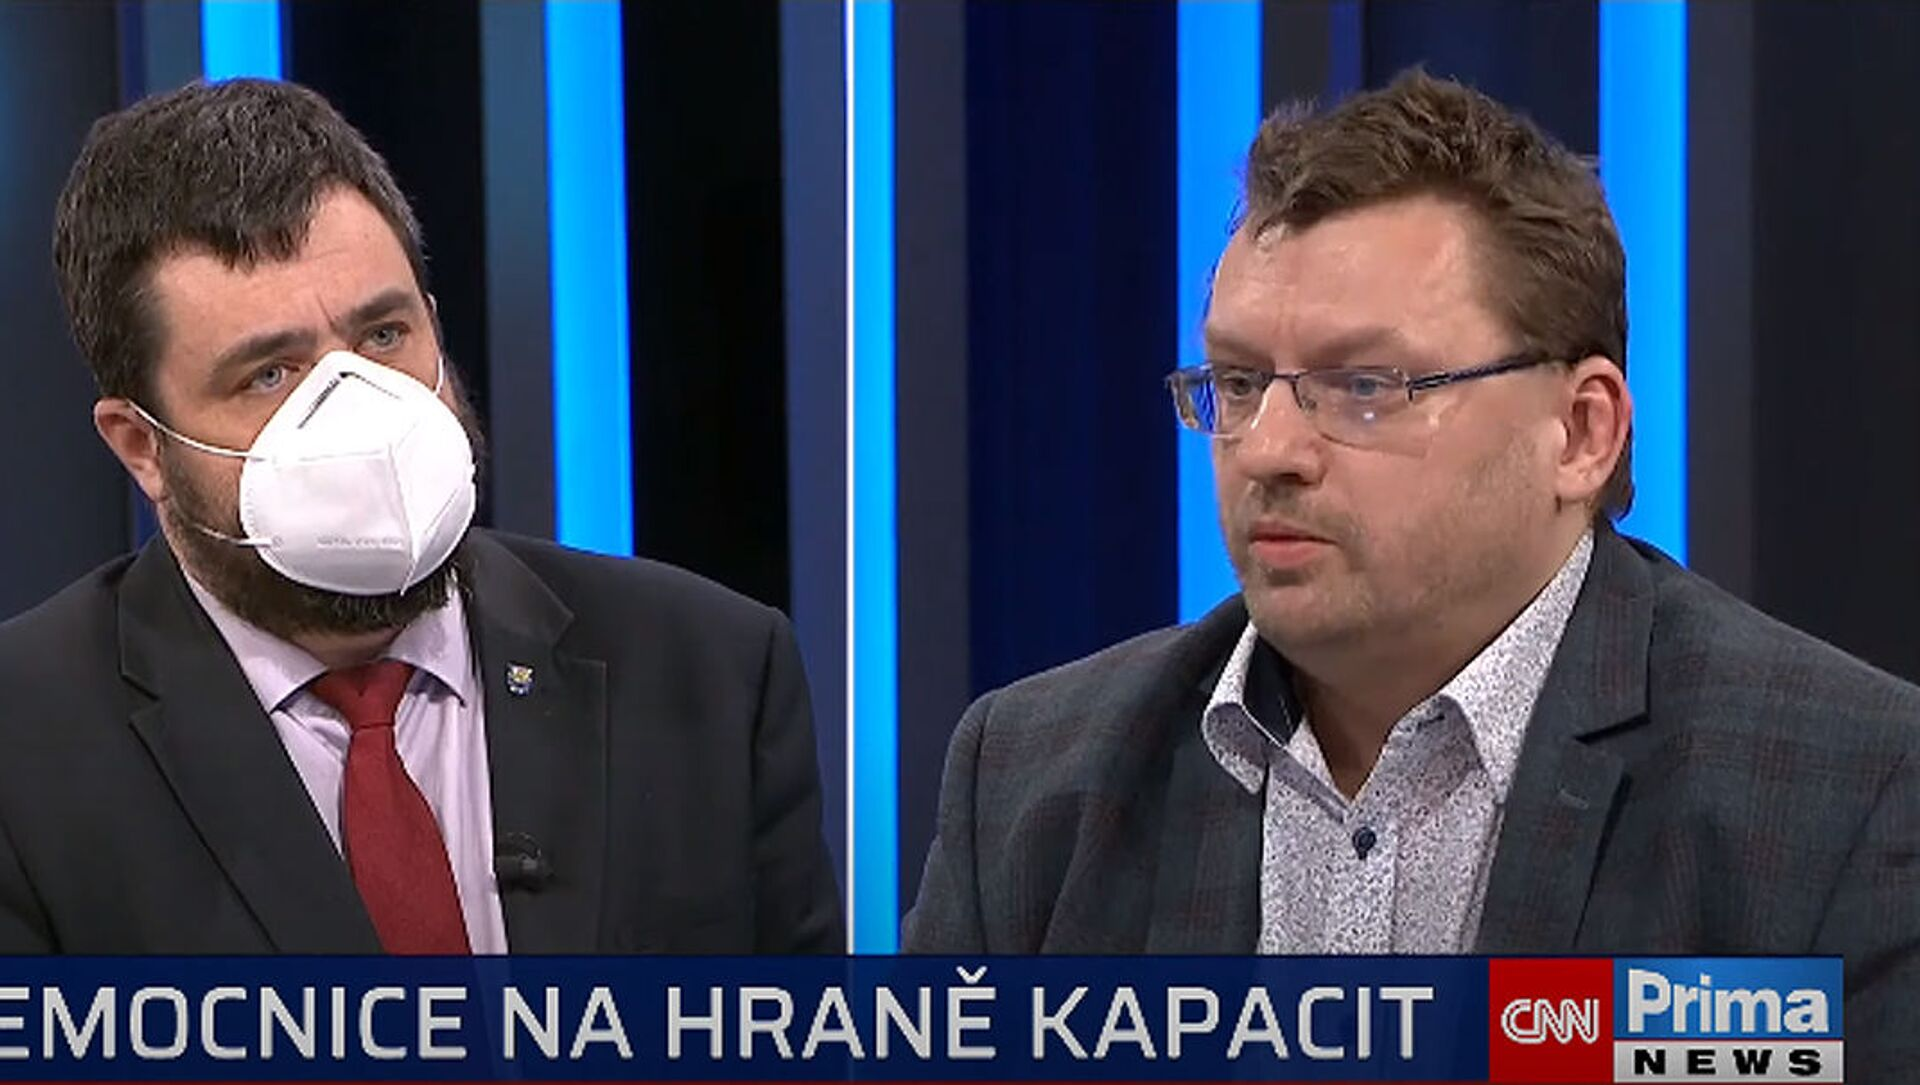 Pavel Novotný a Lubomír Volný. Pořad 360° na CNN Prima News - Sputnik Česká republika, 1920, 23.02.2021